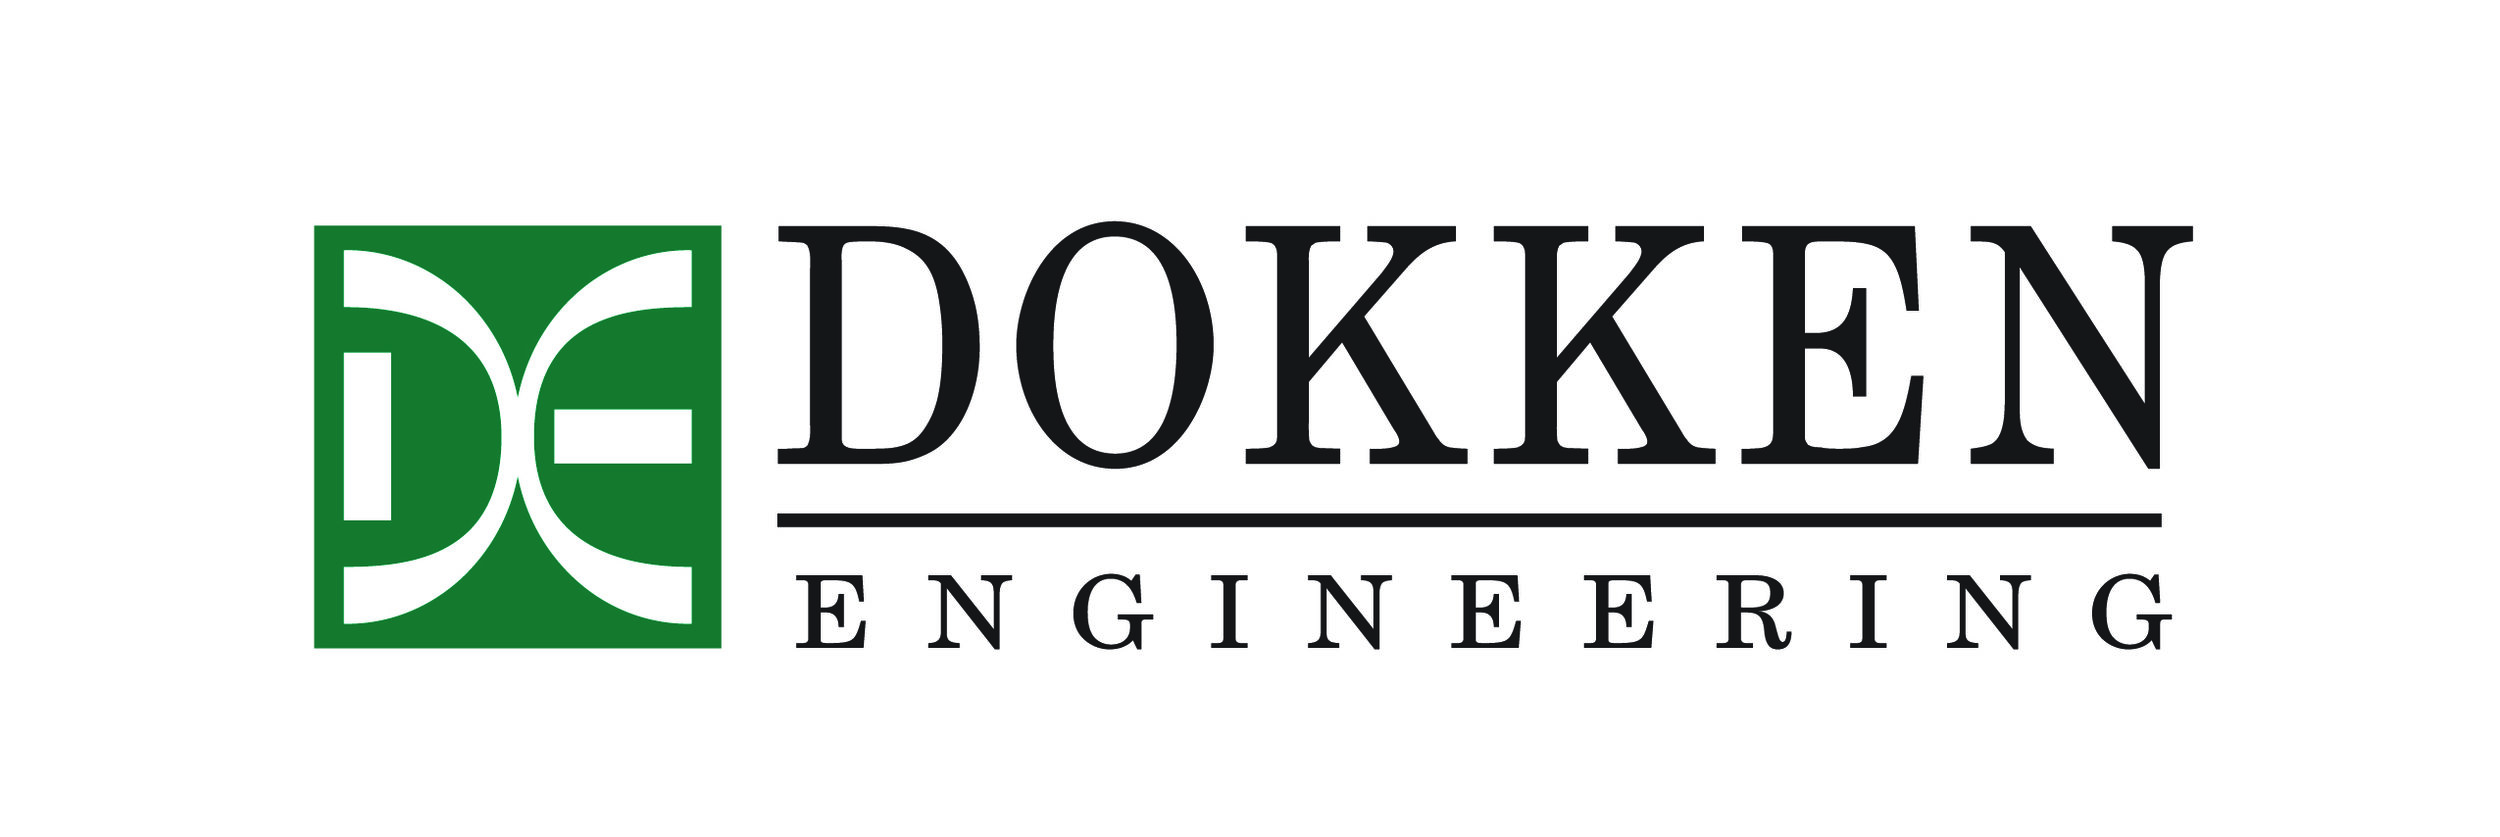 Dokken_Engineering.jpg